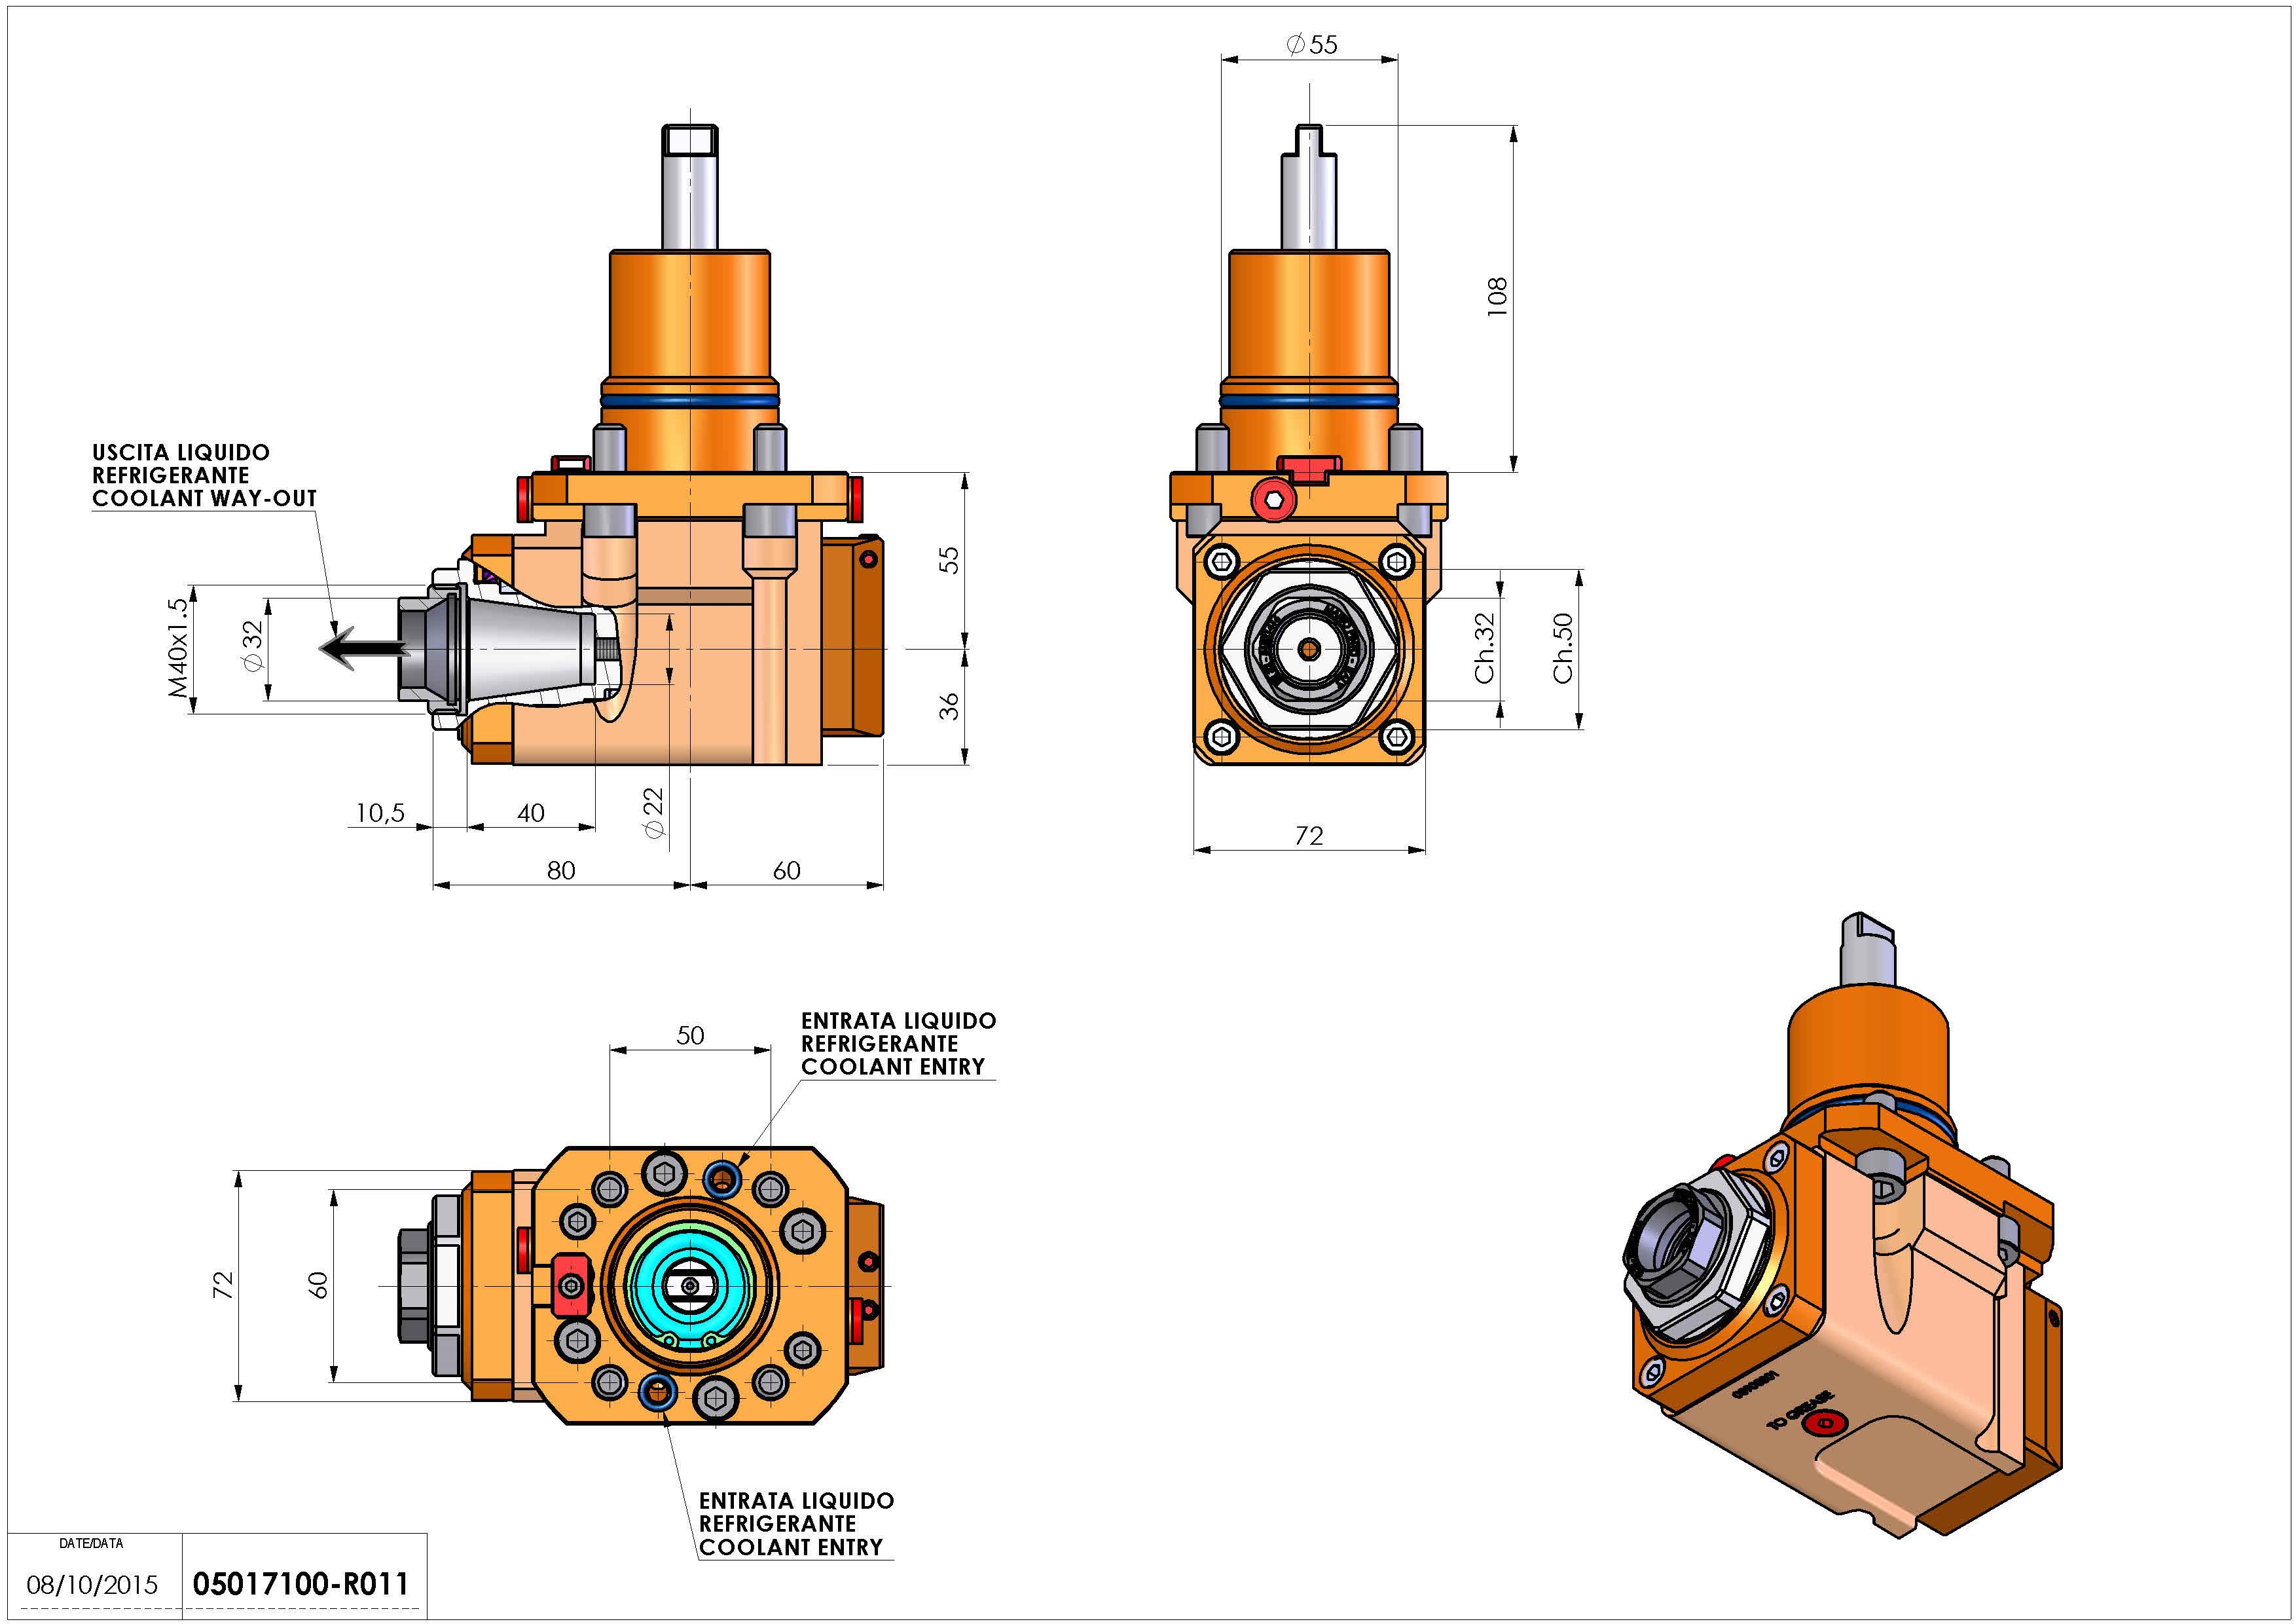 Technical image - LT-A D55 ER32F RF 2:1 H55 NK.